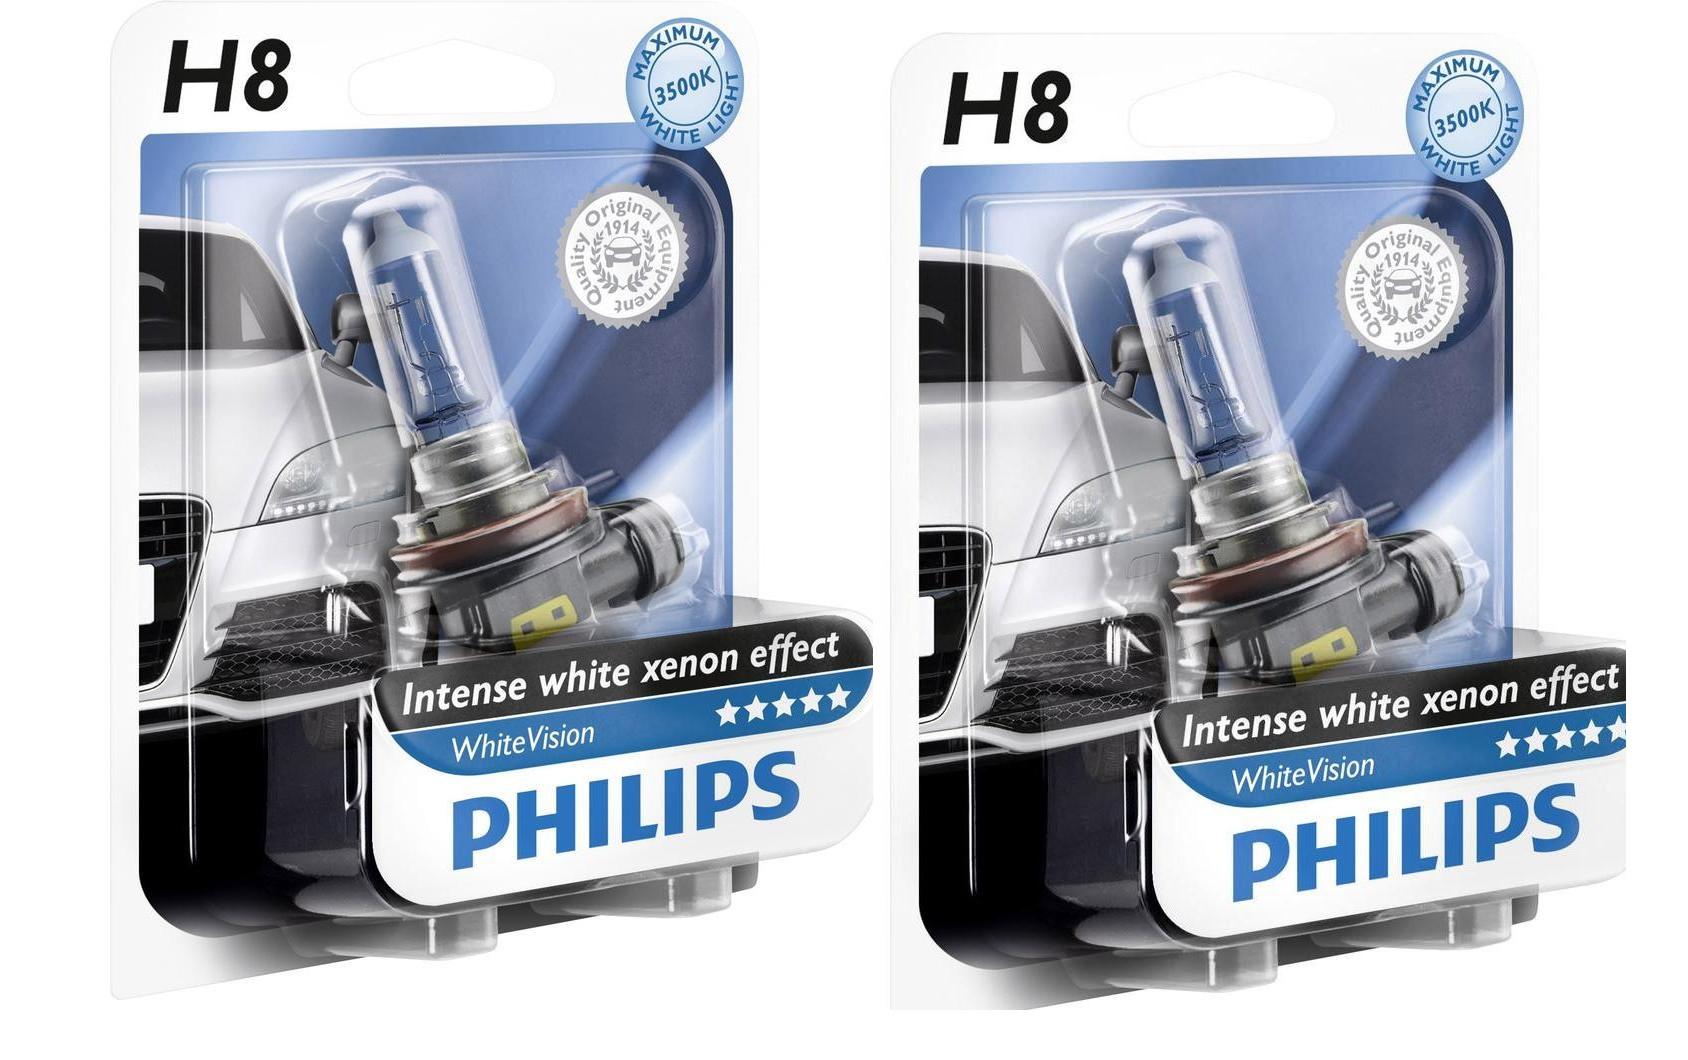 Voiture Feux Blanc Moto Vision Xénon H8 Philips White Ampoule Phares OTXZiuPk